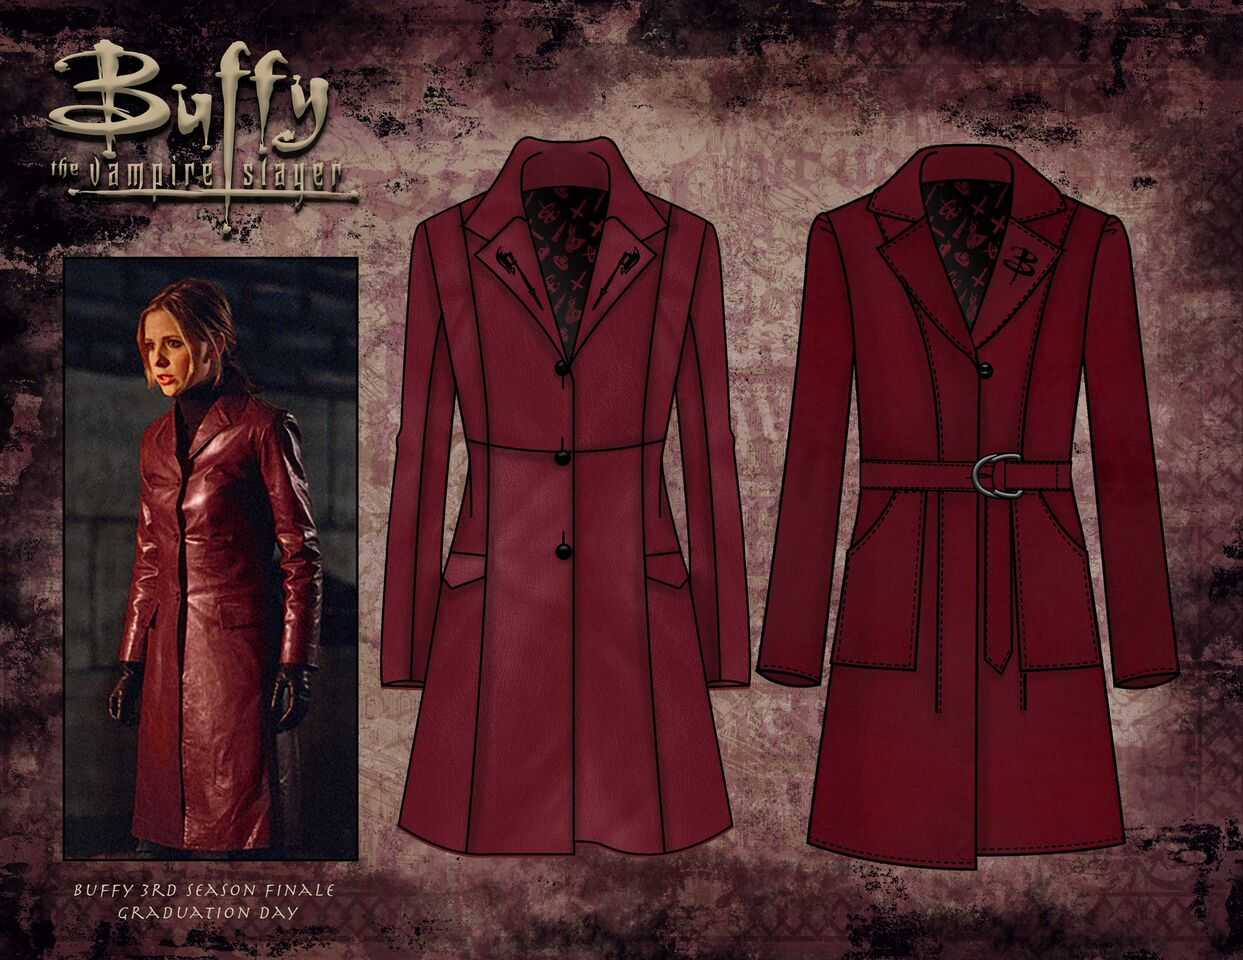 Buffy The Vampire Slayer Gets New Merchandise For Its 20th Anniversary | buffy the vampire slayer